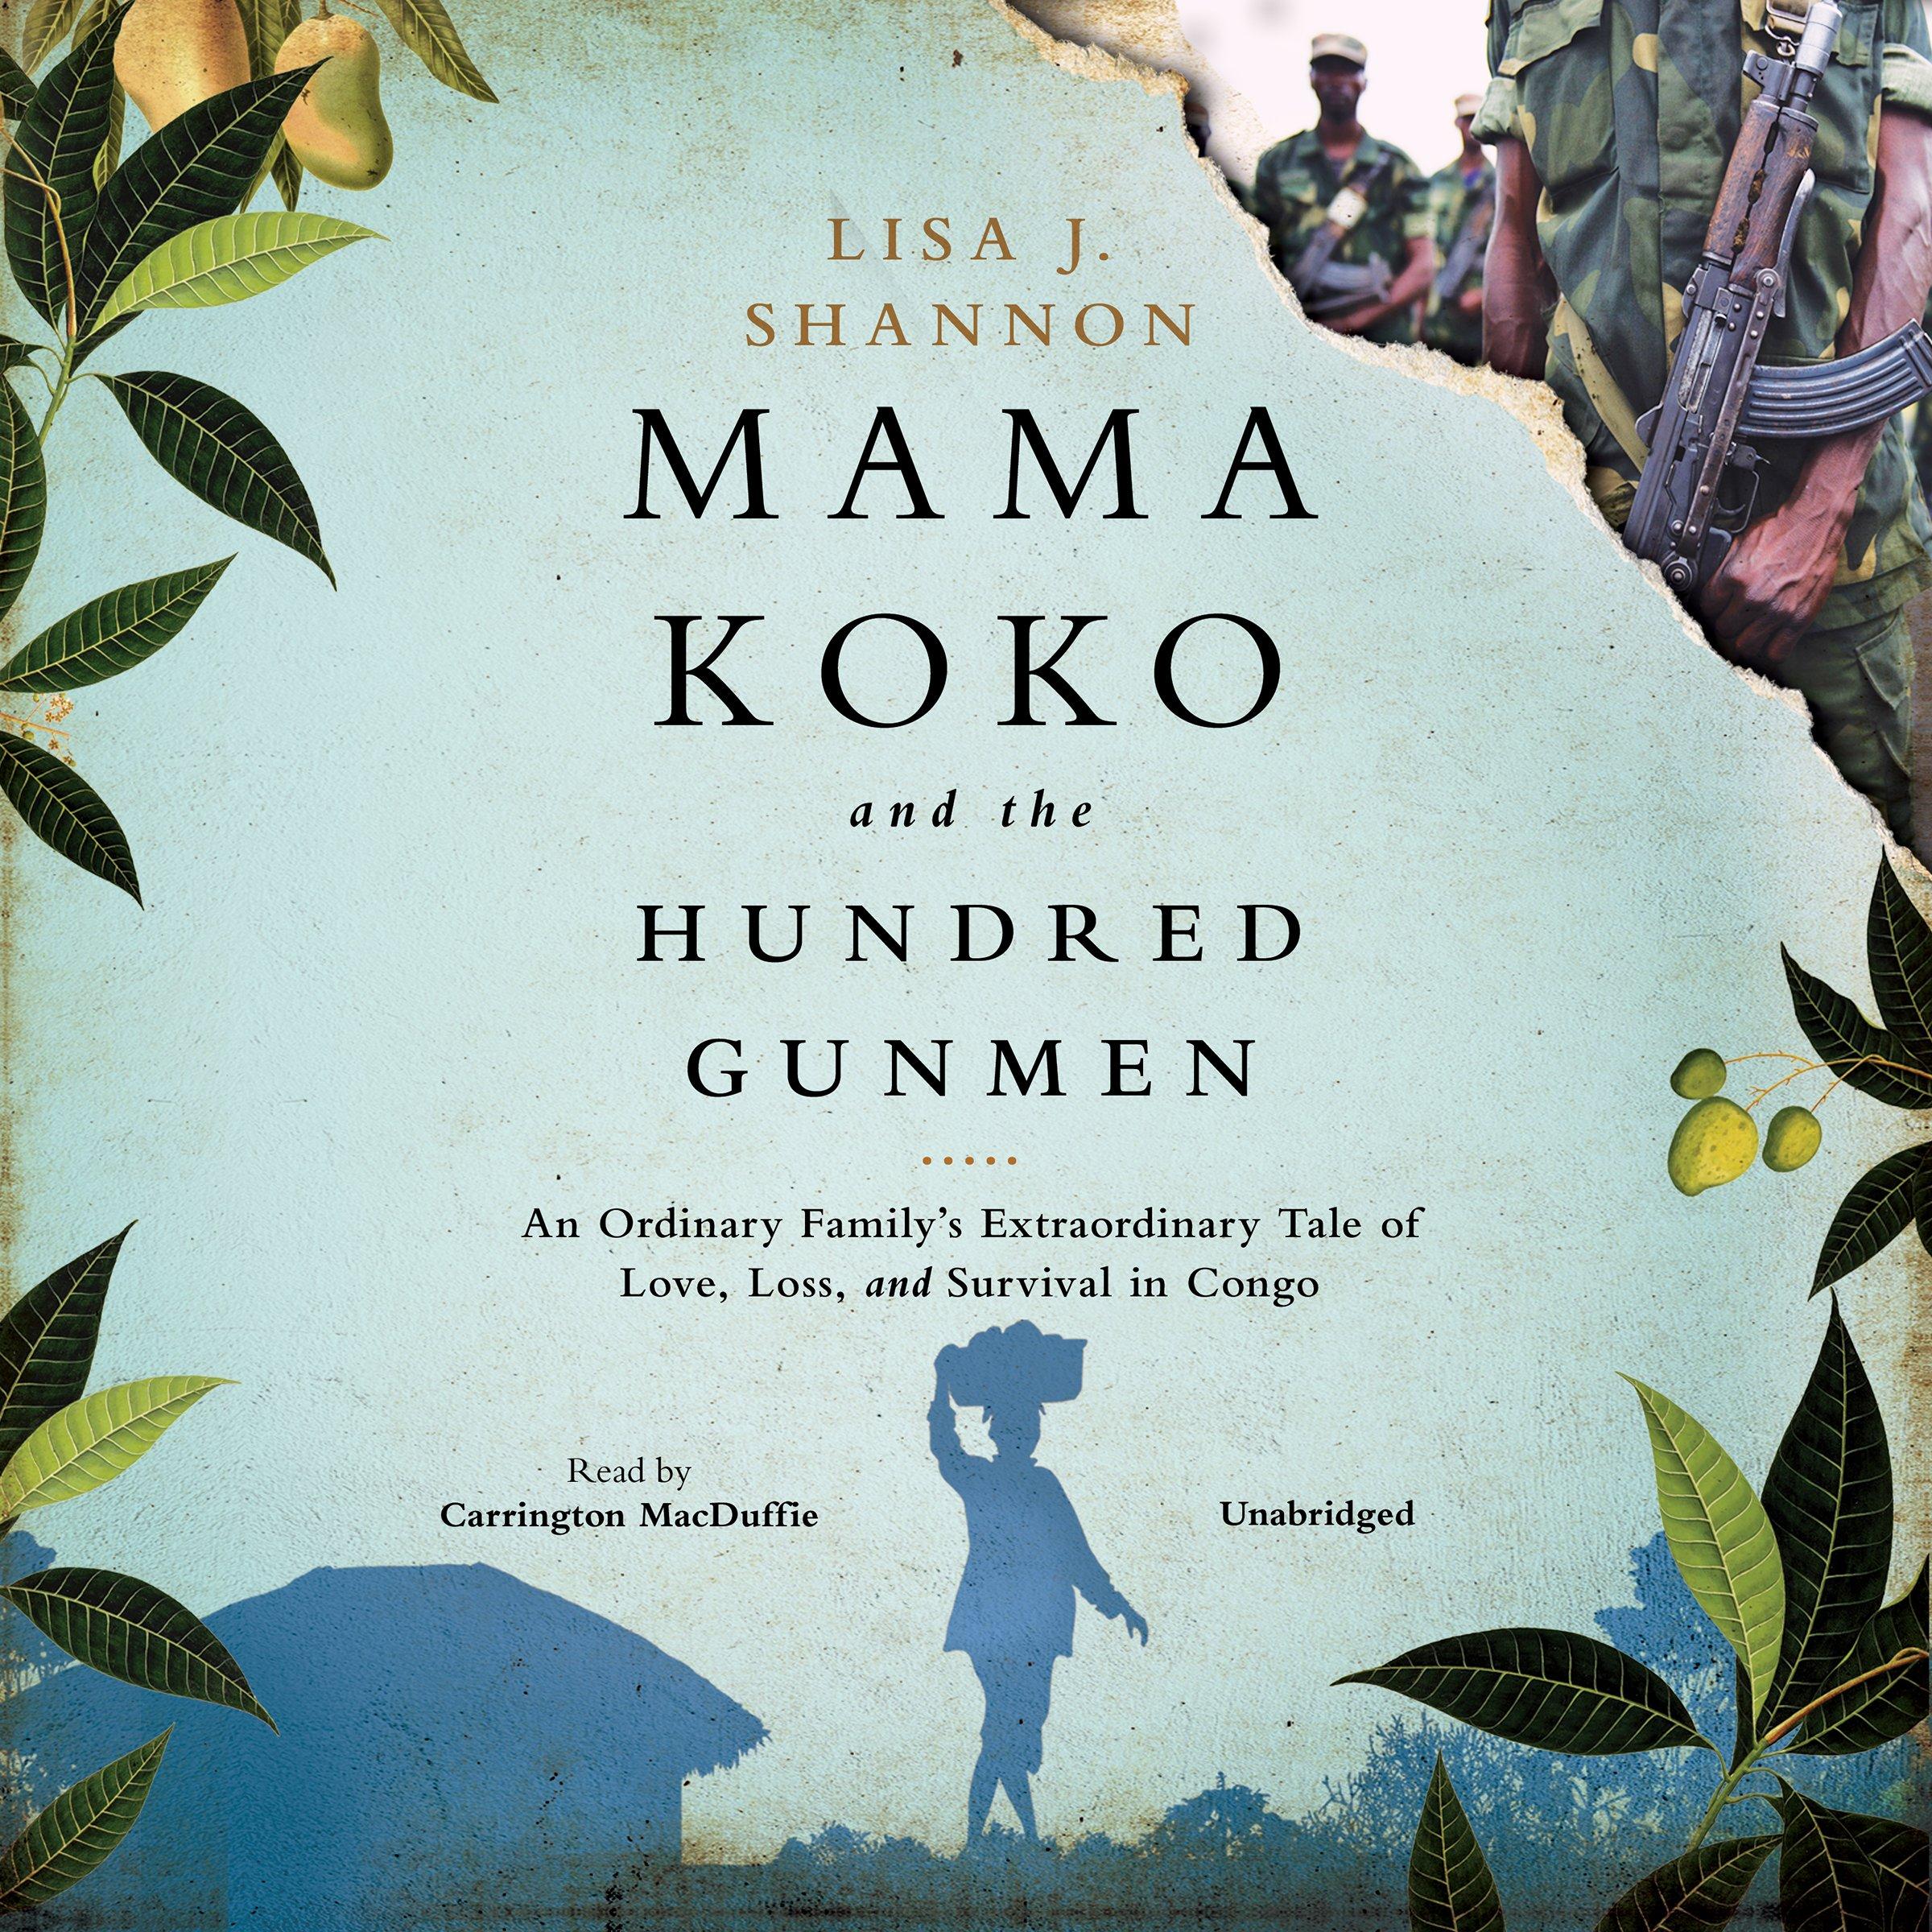 Mama Koko and the Hundred Gunmen: An Ordinary Family's Extraordinary Tale of Love, Loss, and Survival in Congo by Blackstone Audio, Inc. (Image #1)